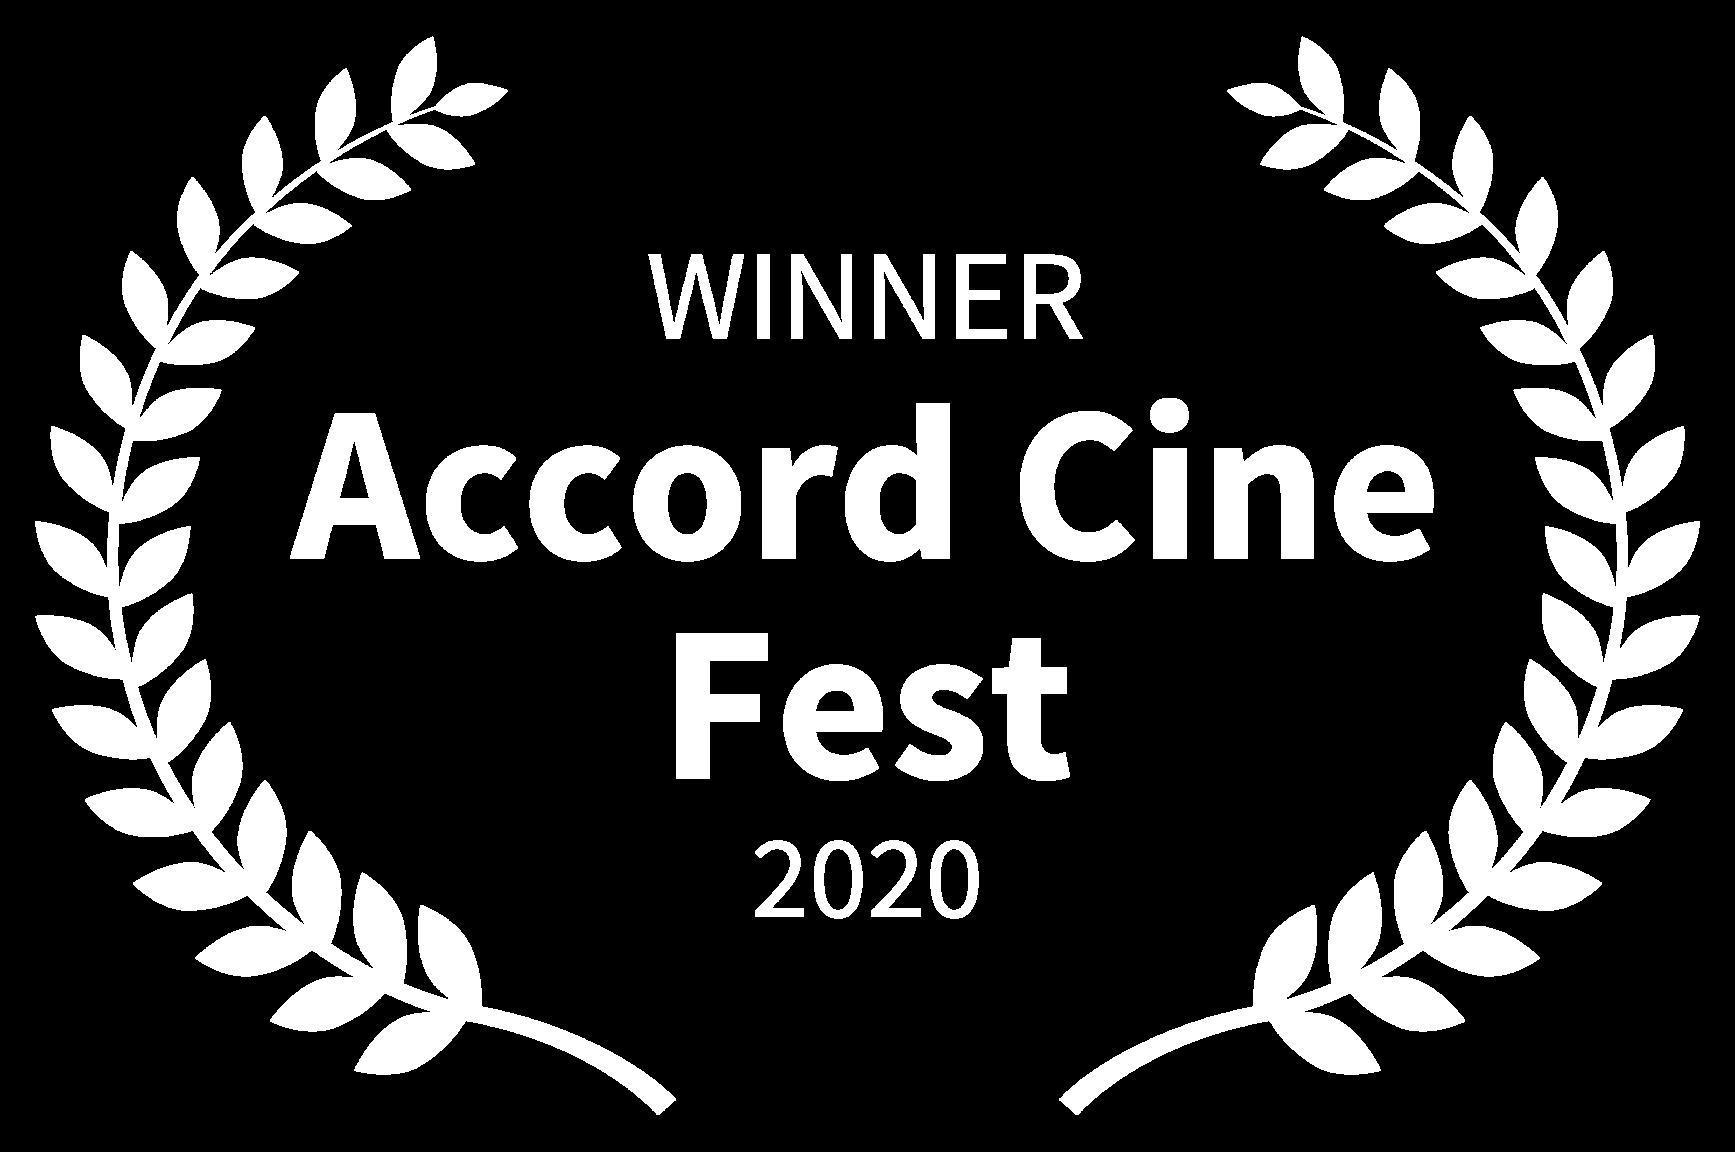 WINNER - Accord Cine Fest - 2020